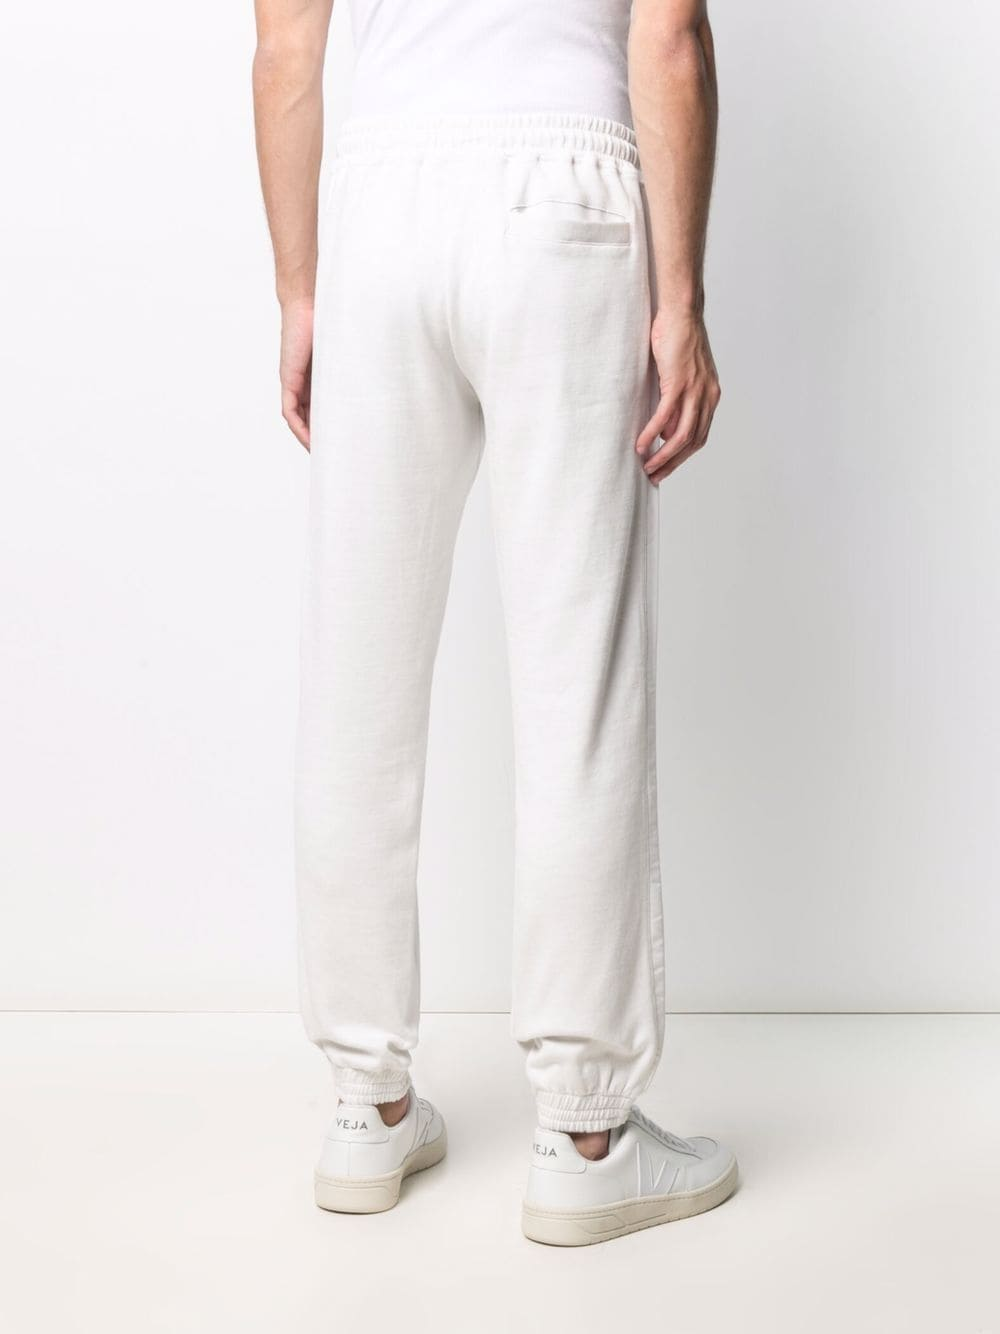 Pantaloni sportivi a righe tono su tono in cotone bianco ELEVENTY | Pantaloni | C75FELC13-TES0C17901-01